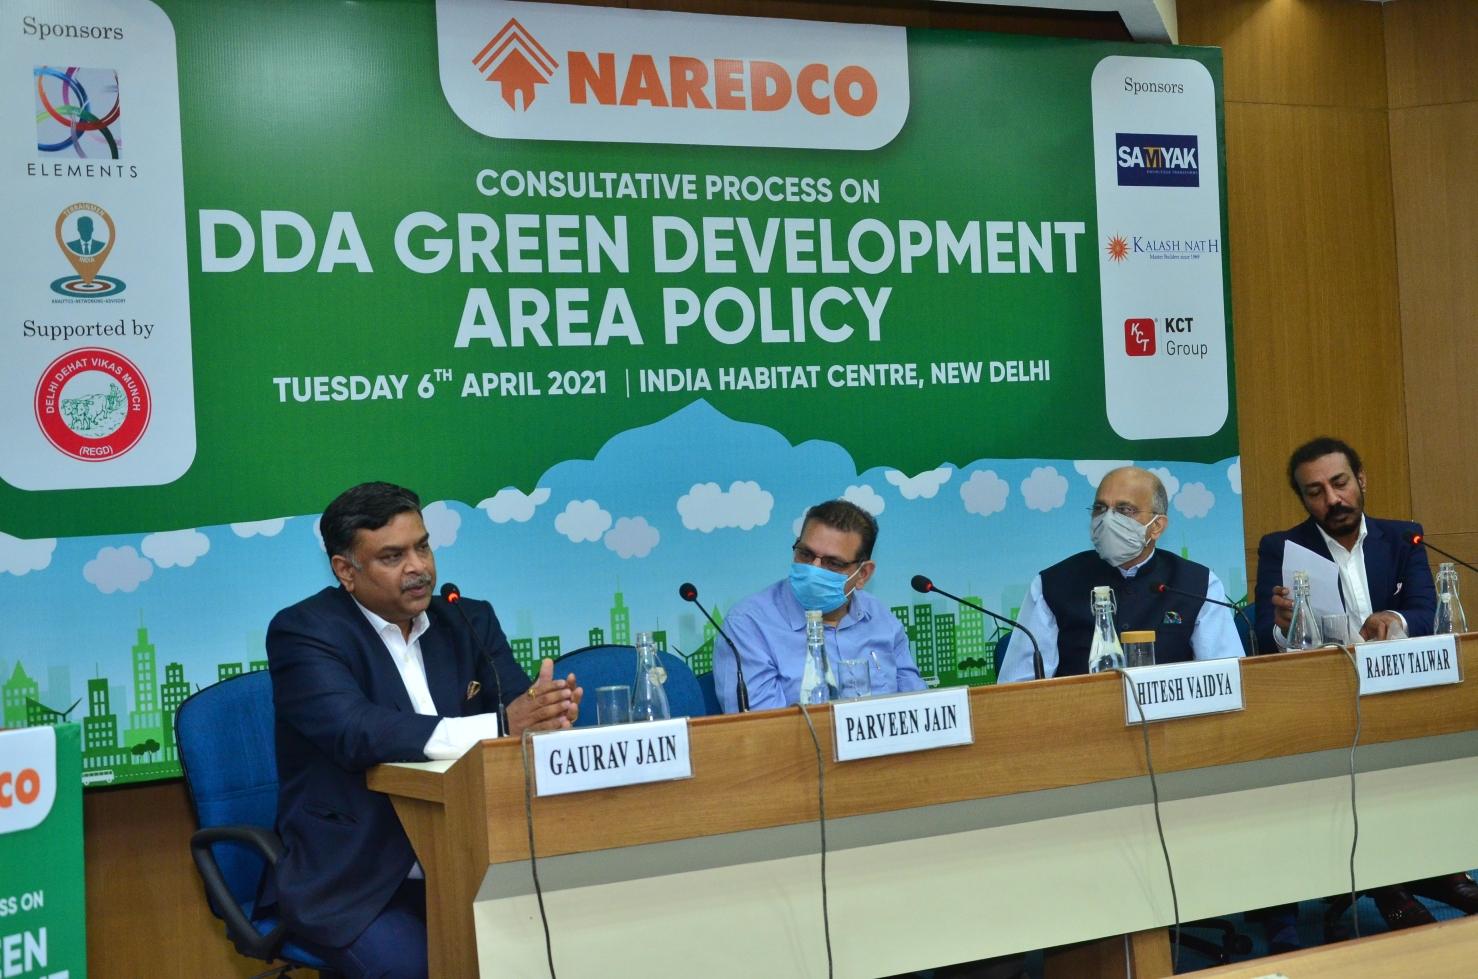 NAREDCO welcomes DDA Green Development Area Policy to boost green development and curb pollution in Delhi